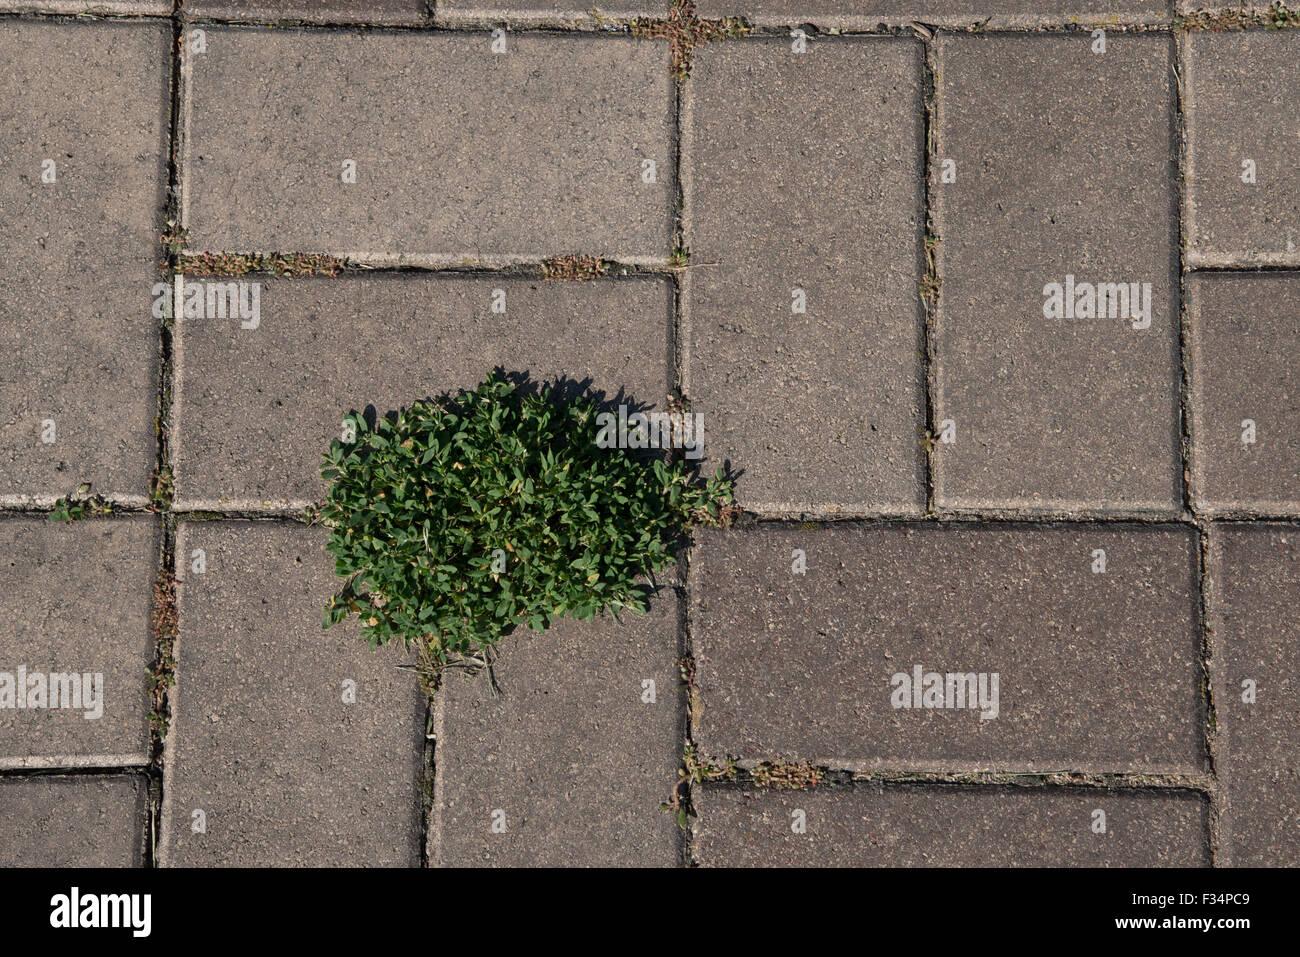 Rectangular brick patio paving blocks form an interesting pattern ...